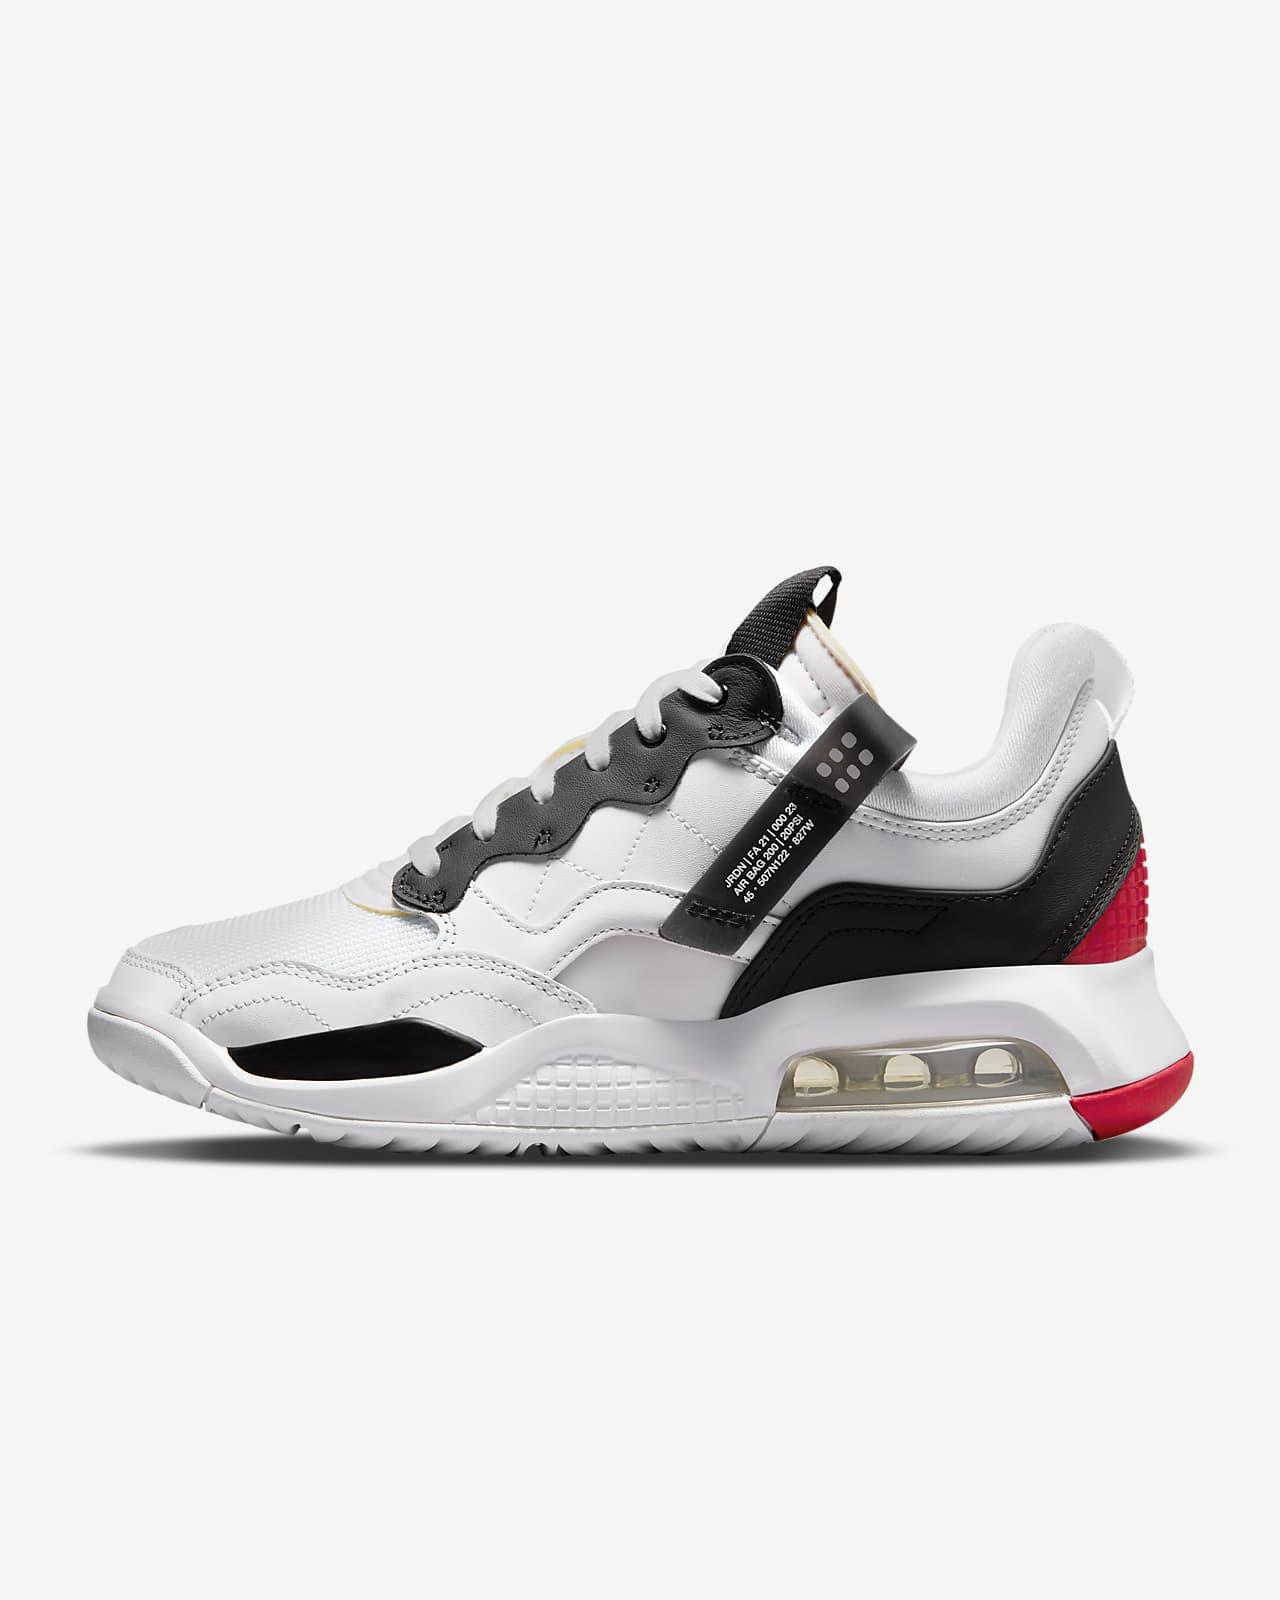 Jordan MA2 Shoes